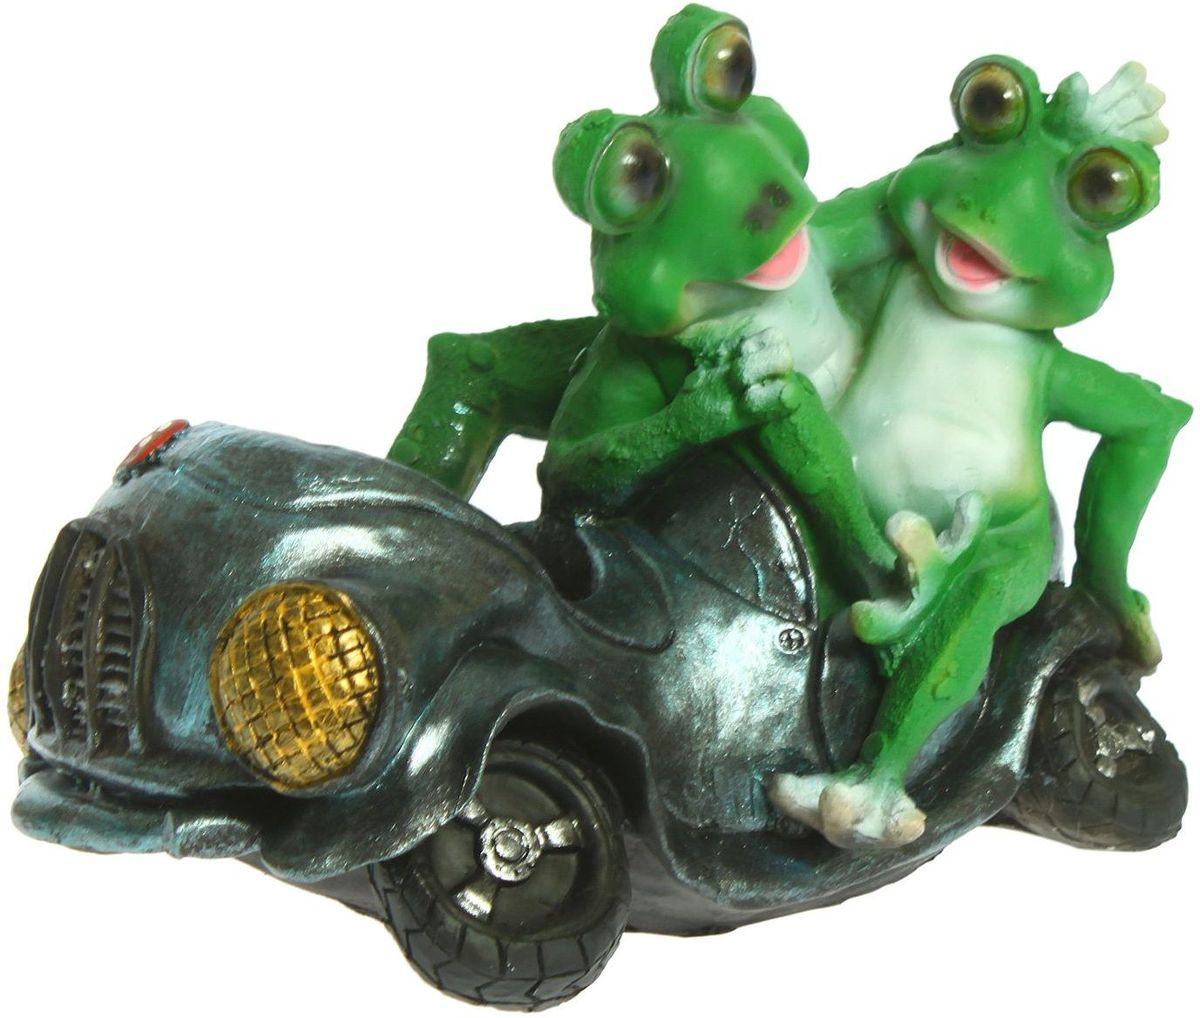 Фигура садовая Лягушки около автомобиля, 34 х 22 х 24 см фигура садовая утка в гнезде 34 х 24 х 26 см